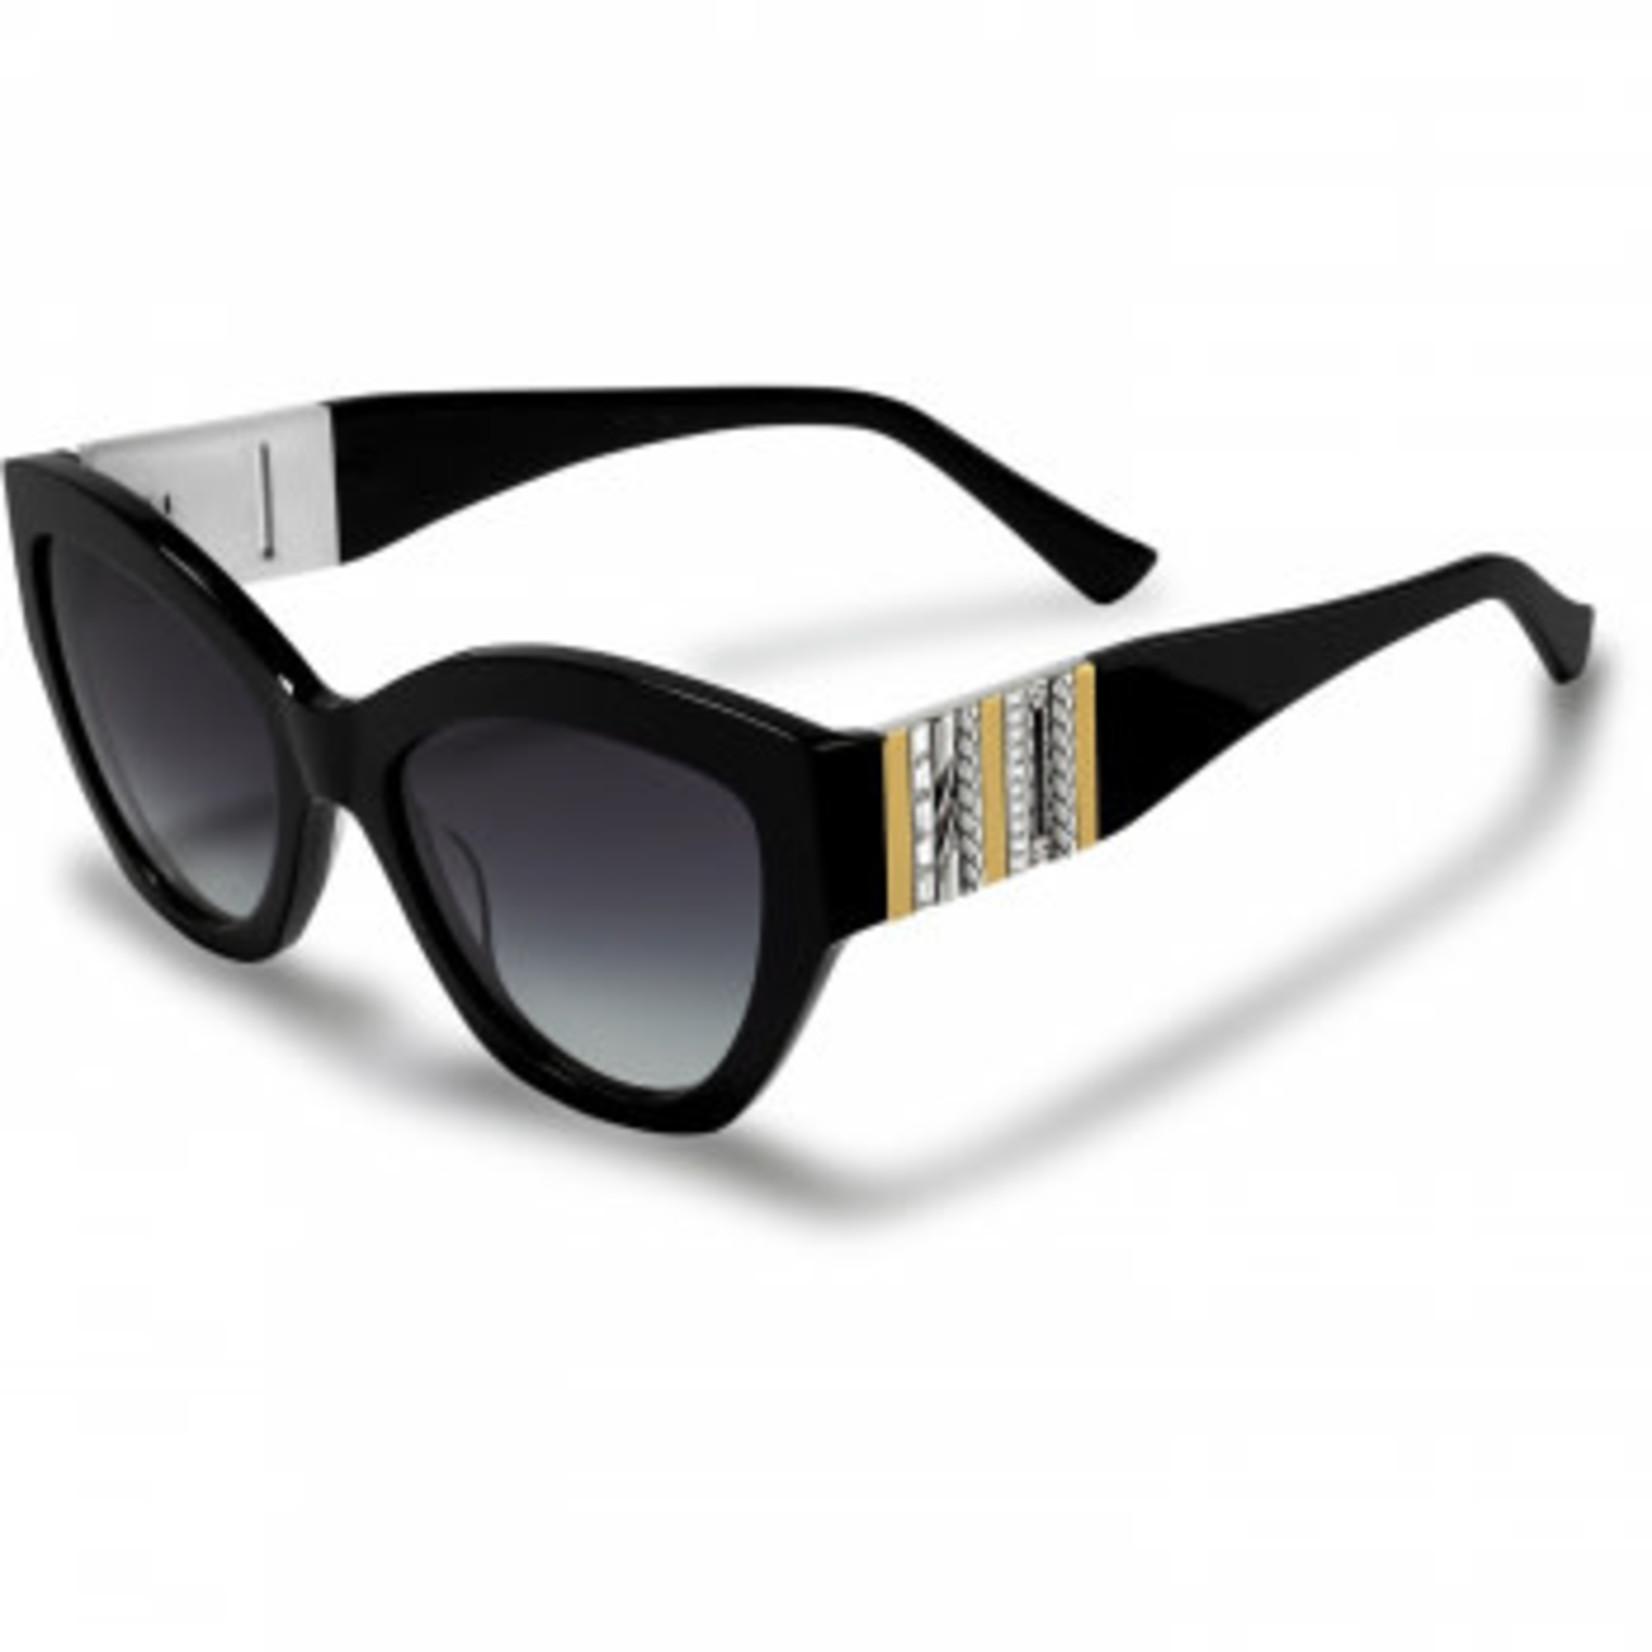 Brighton Tapestry Sunglasses Black-Multi